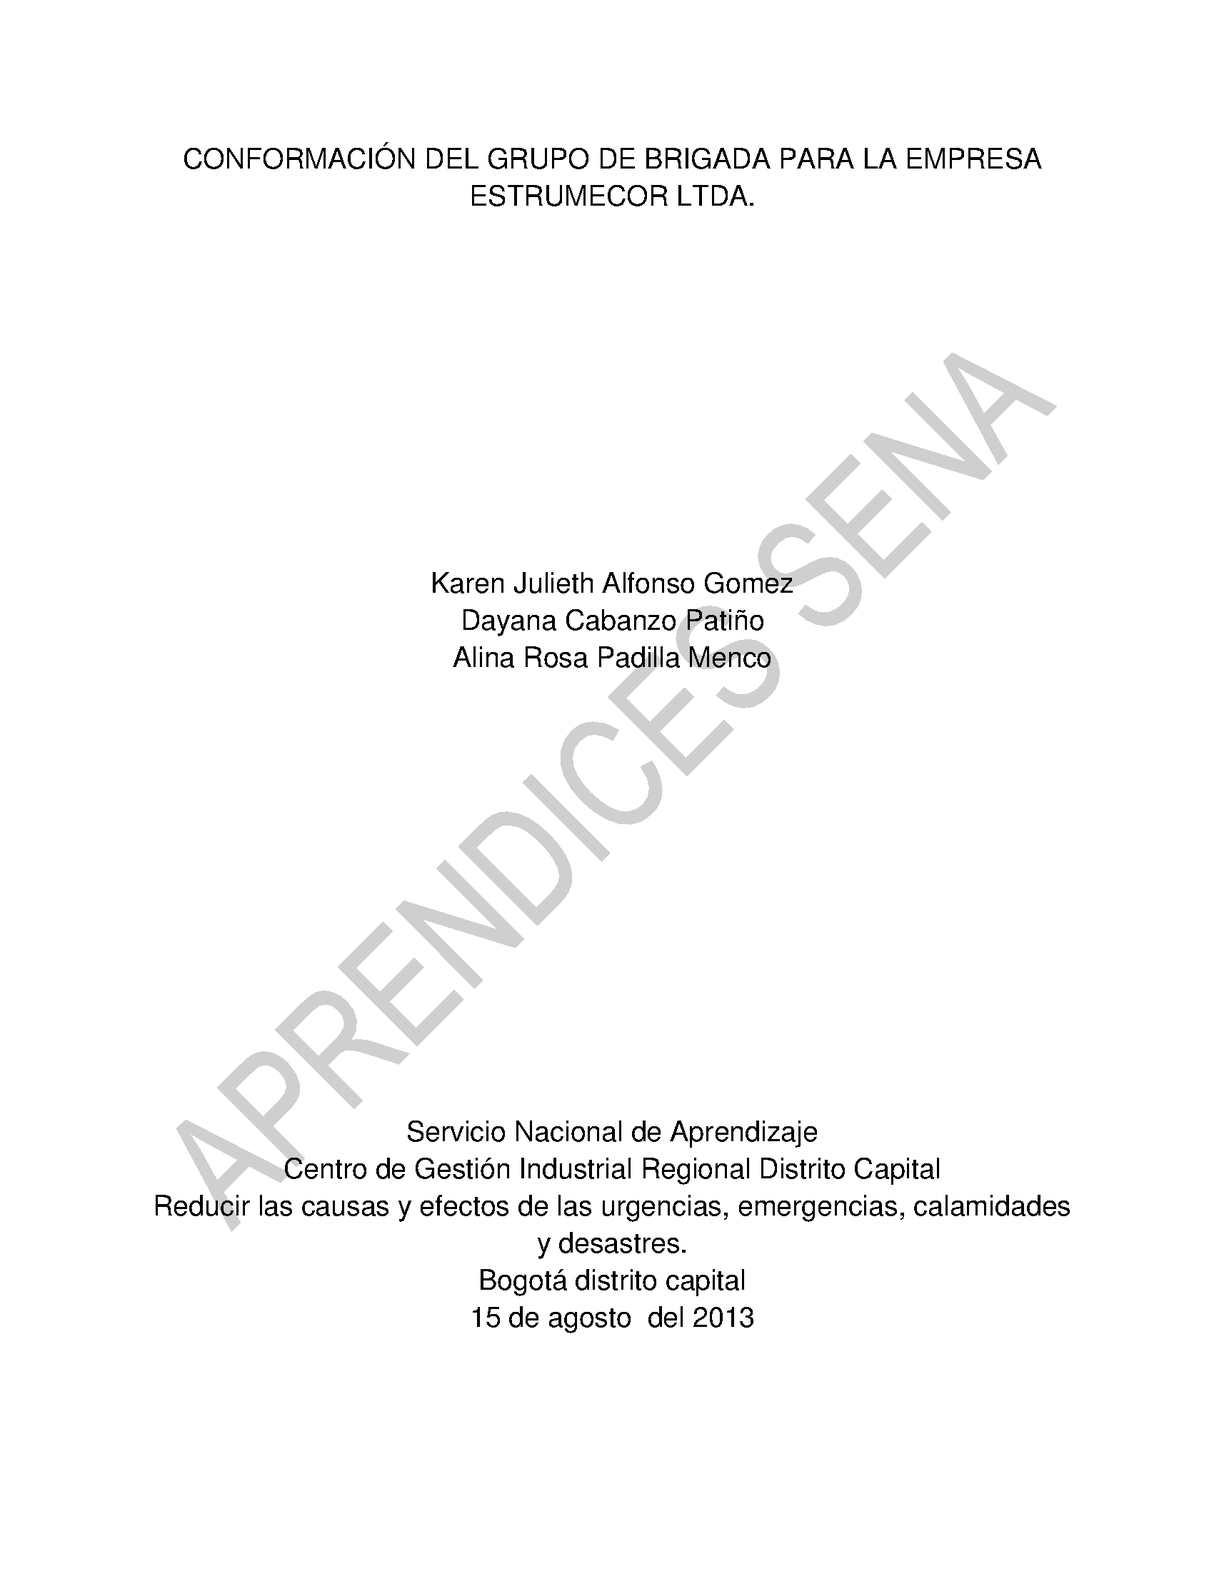 informe Grupo de Brigada de emergencia de la empresa ESTRUMECOR LTDA